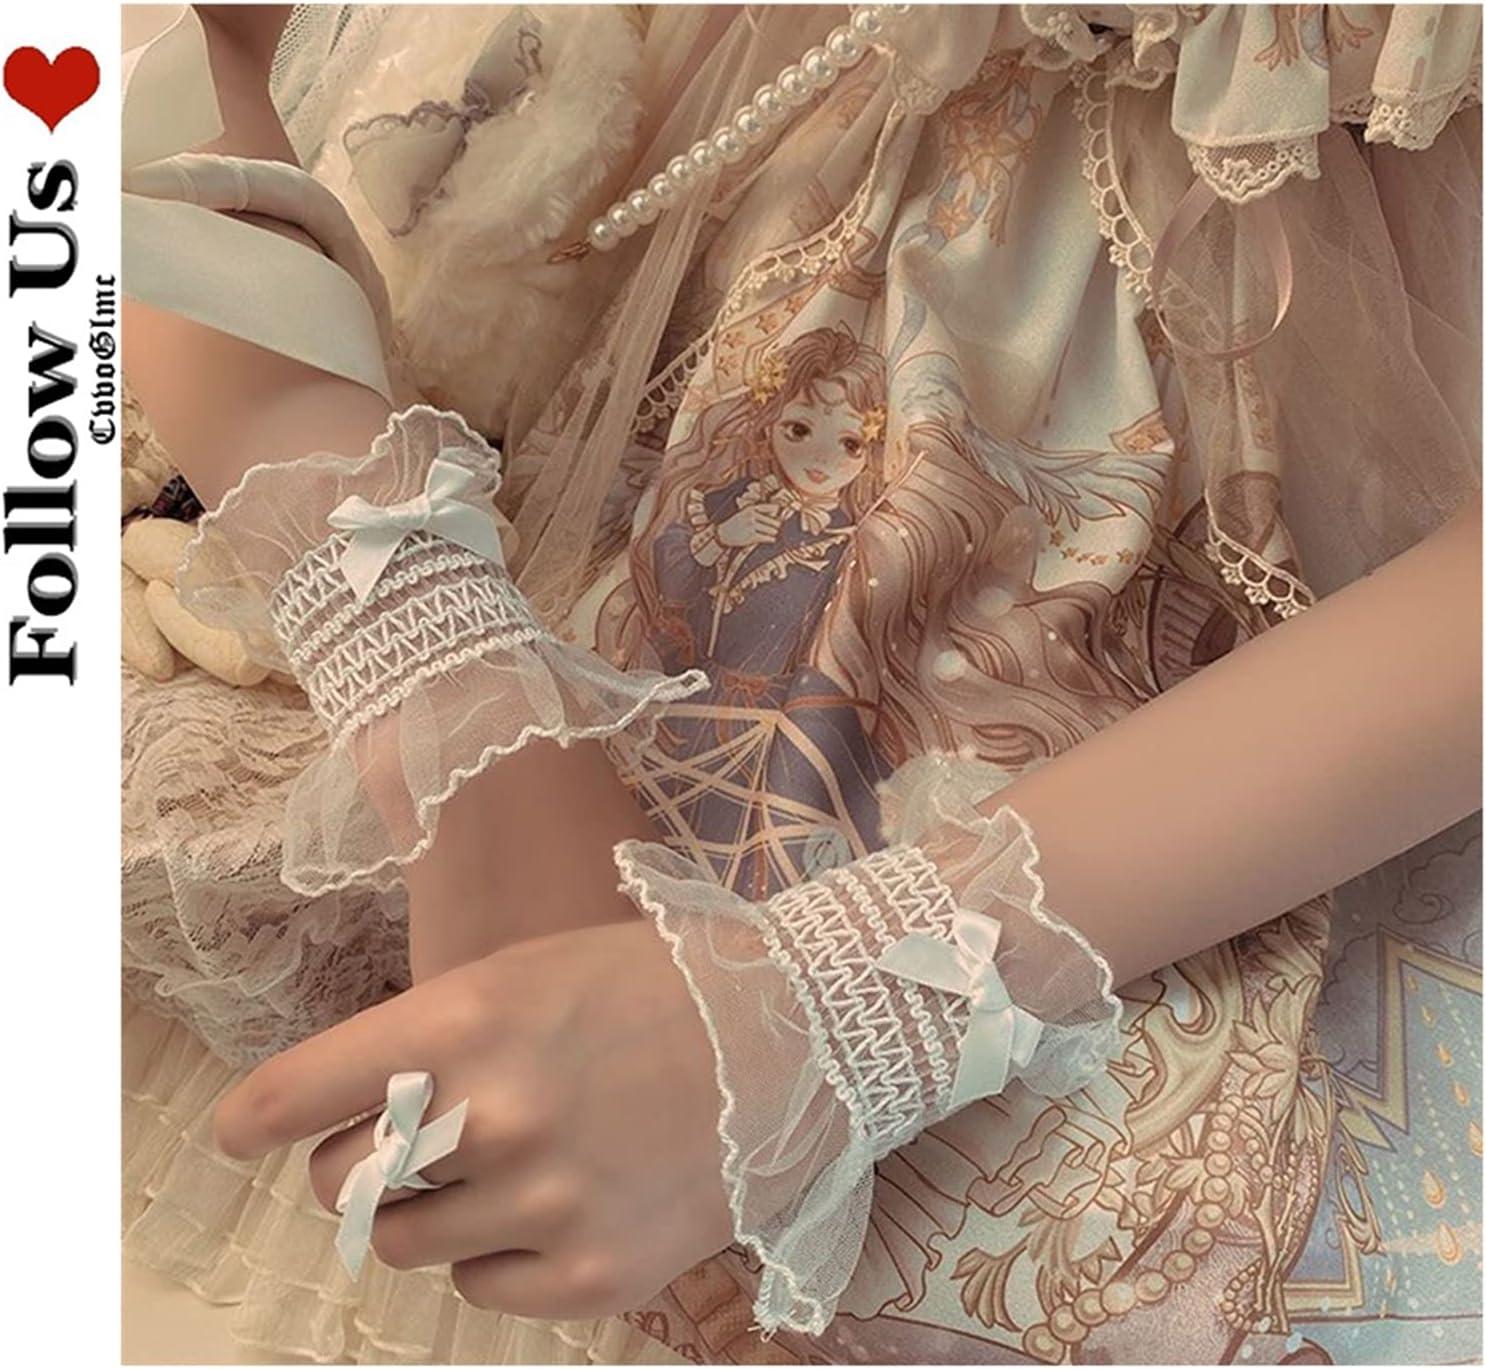 Elegant Lace Gloves Lolita Black Lace Bow Arm Warmer Harajuku Fingerless Cuff Kawaii Gloves Women Cute Girl Wrist Sleeve Cuff Sleeve Cuff Women (Color : Black, Gloves Size : One Size)